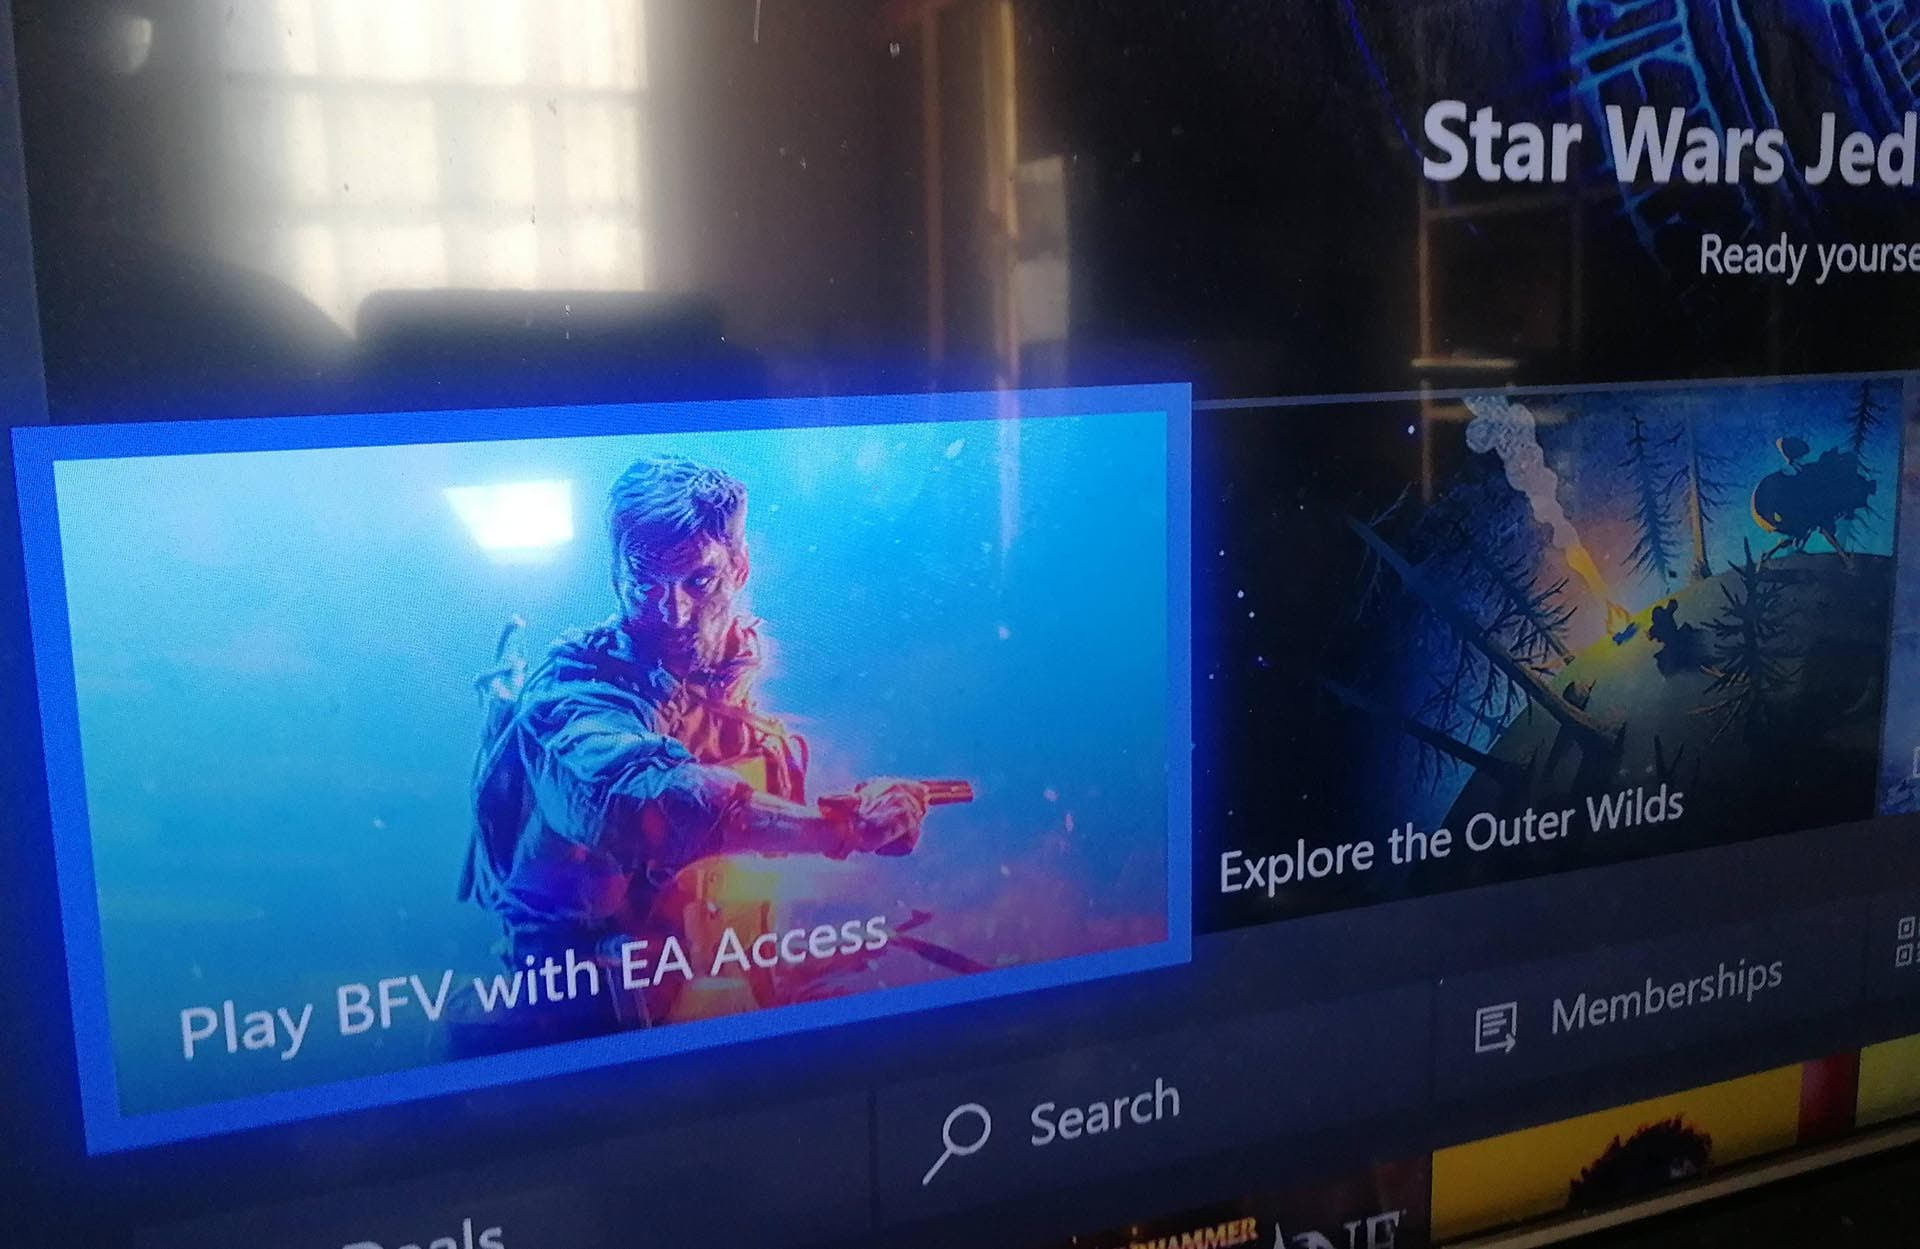 La llegada de Battlefield V a EA Access parece inminente